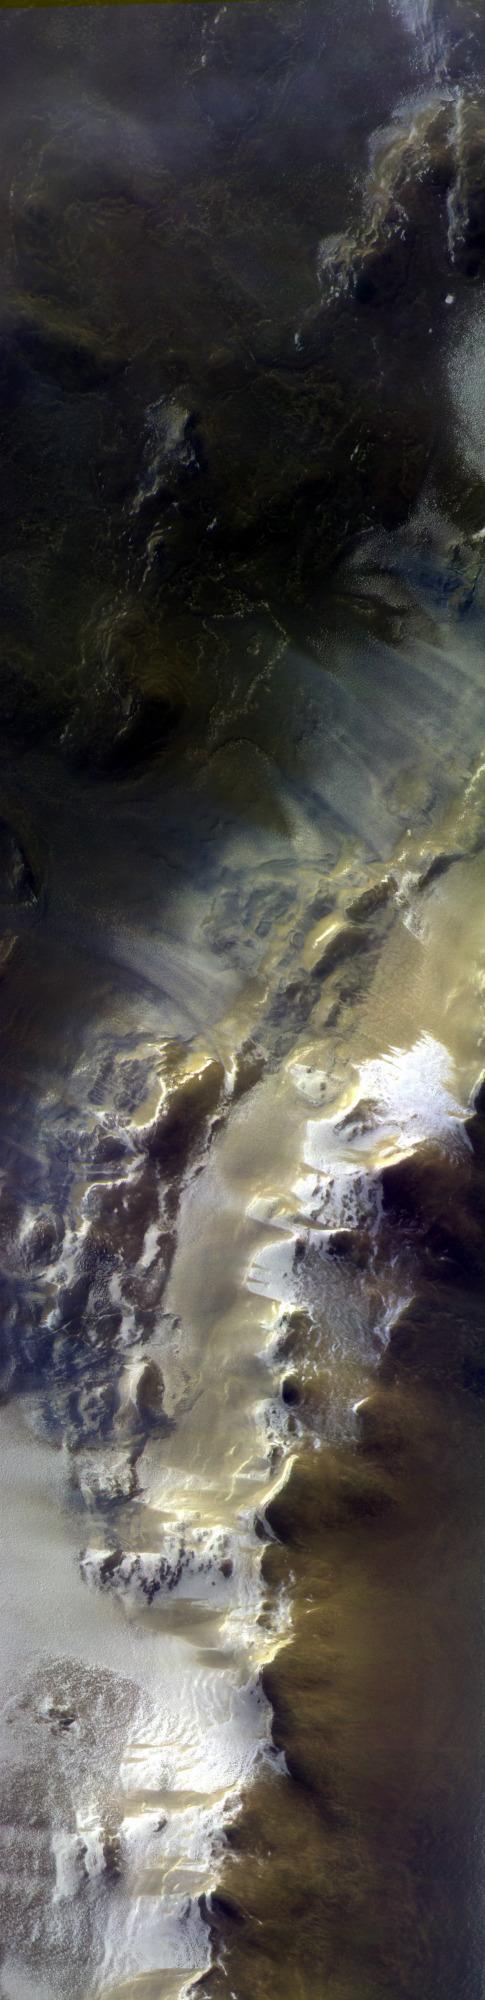 ExoMars images Korolev Crater Full image